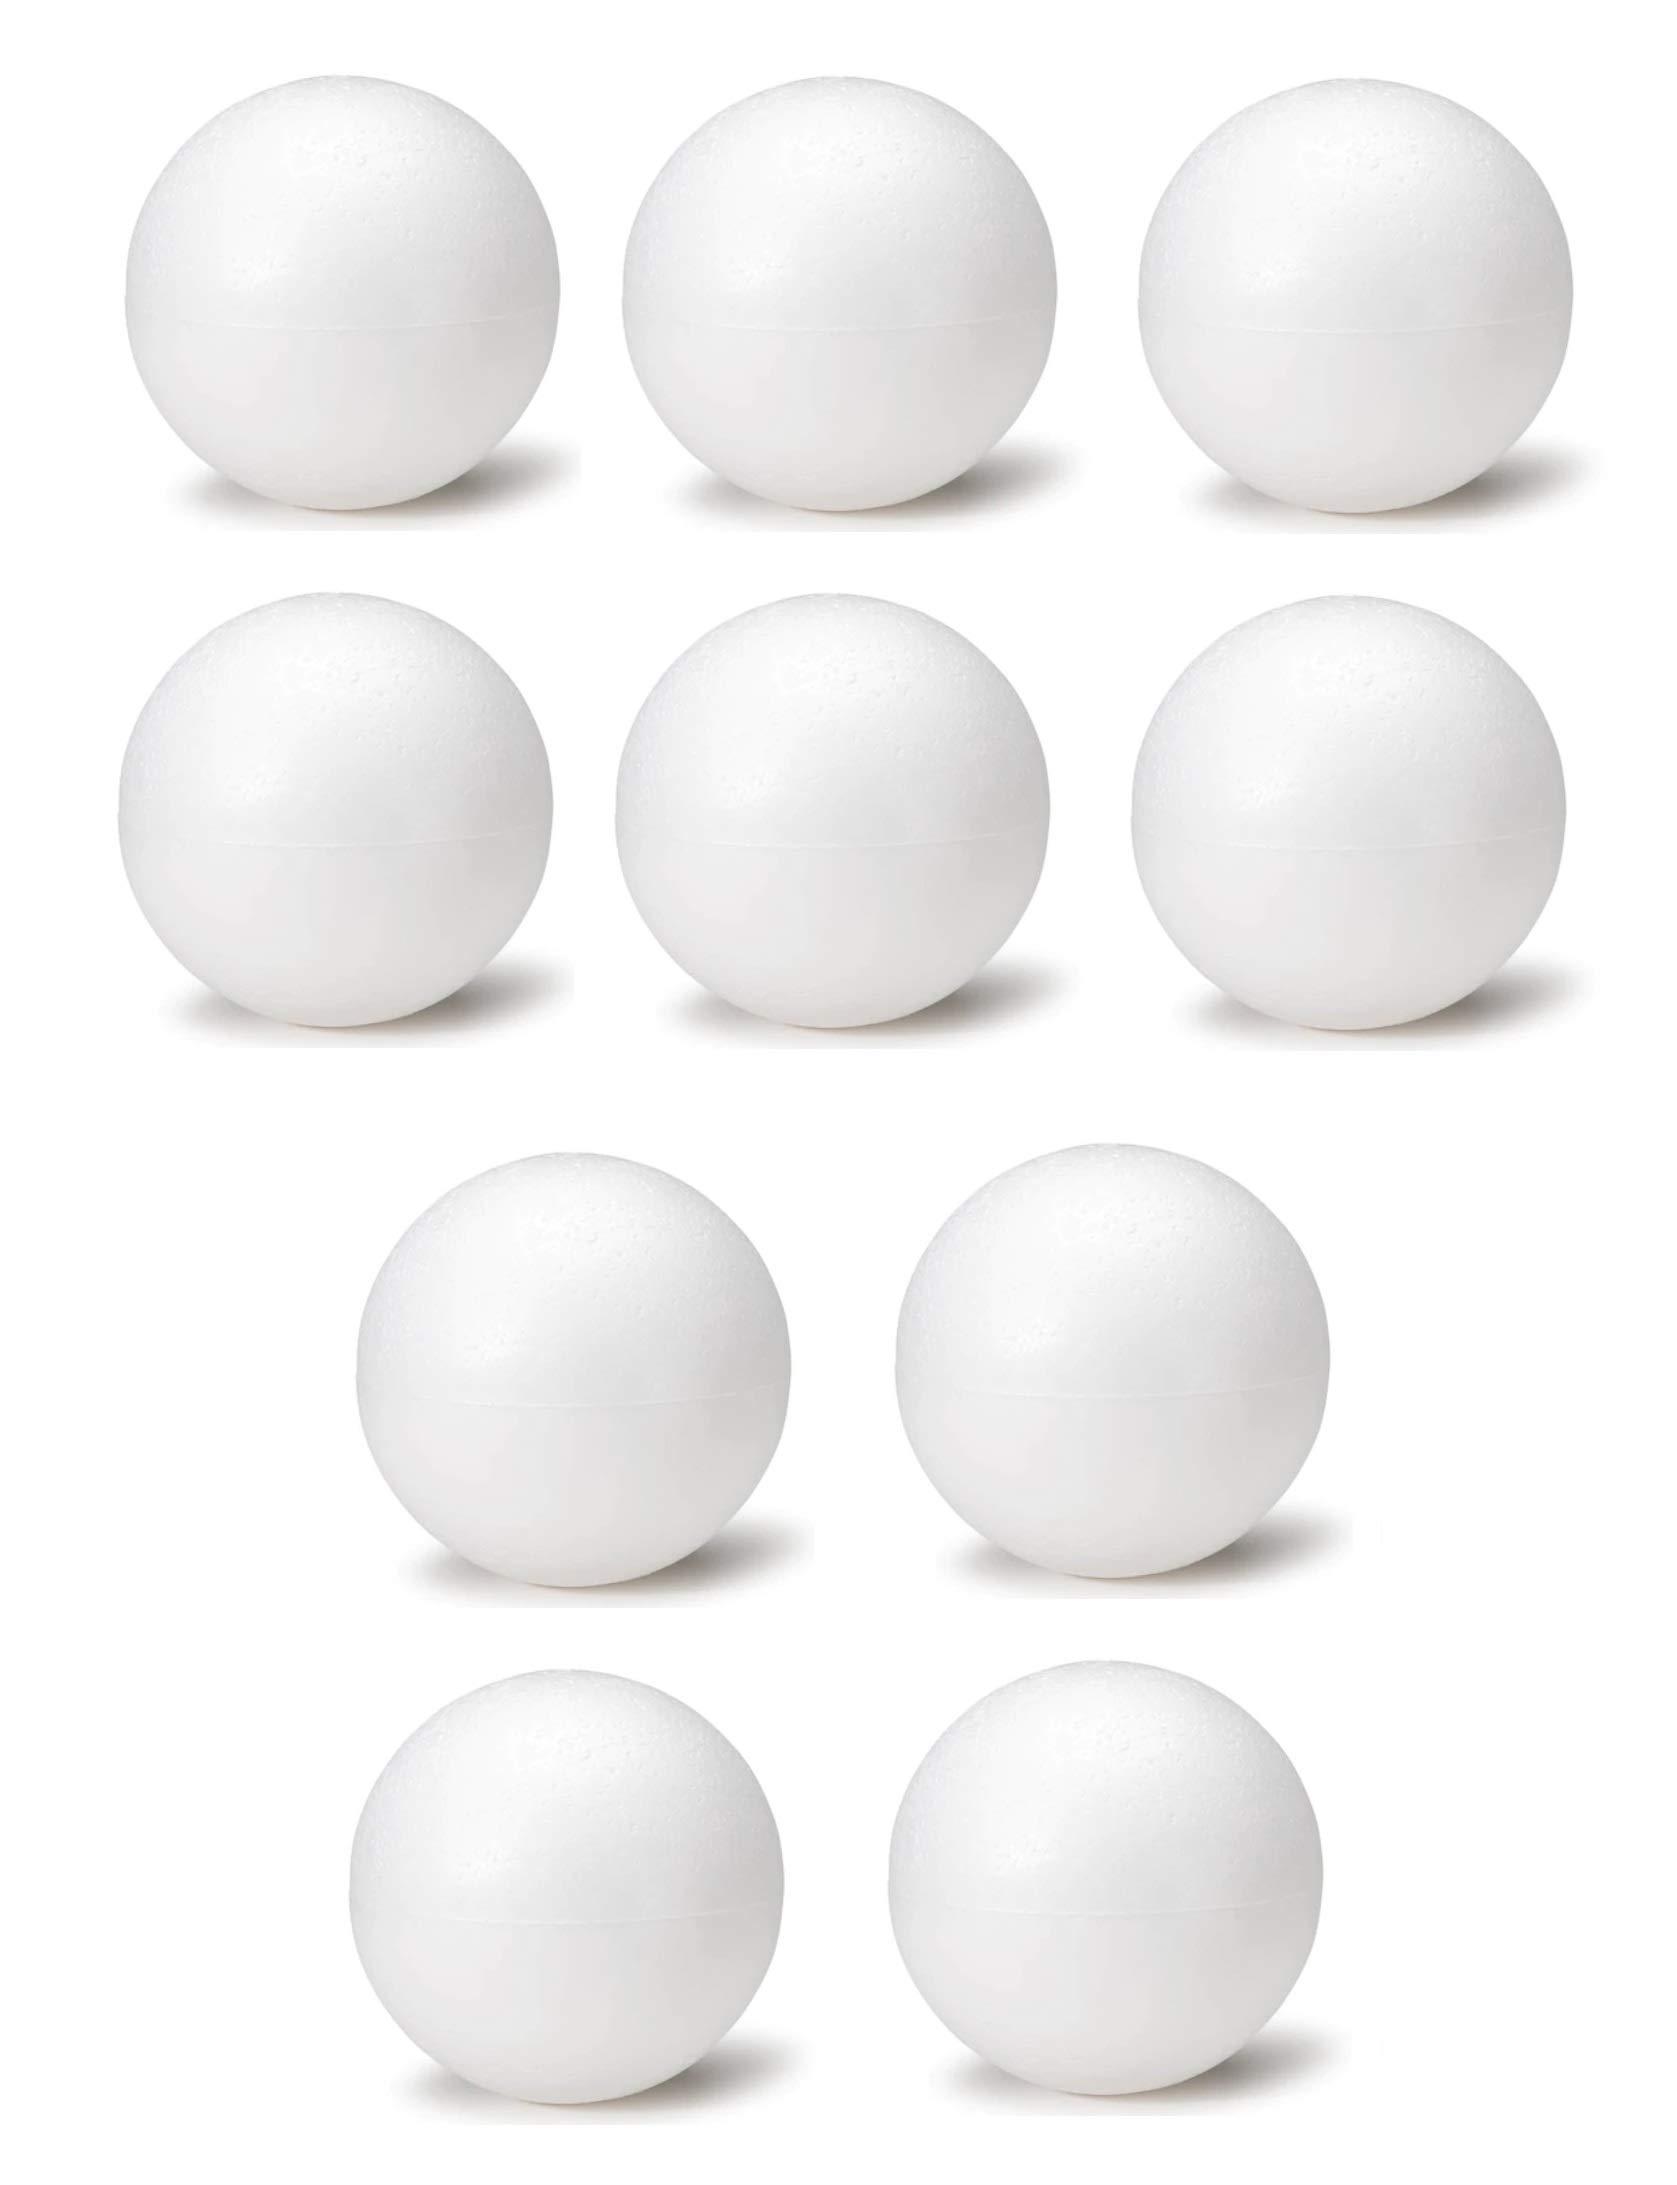 8 Inch White Foam Craft Balls for Art & Crafts Projects Foam Polystyrene Balls (10)